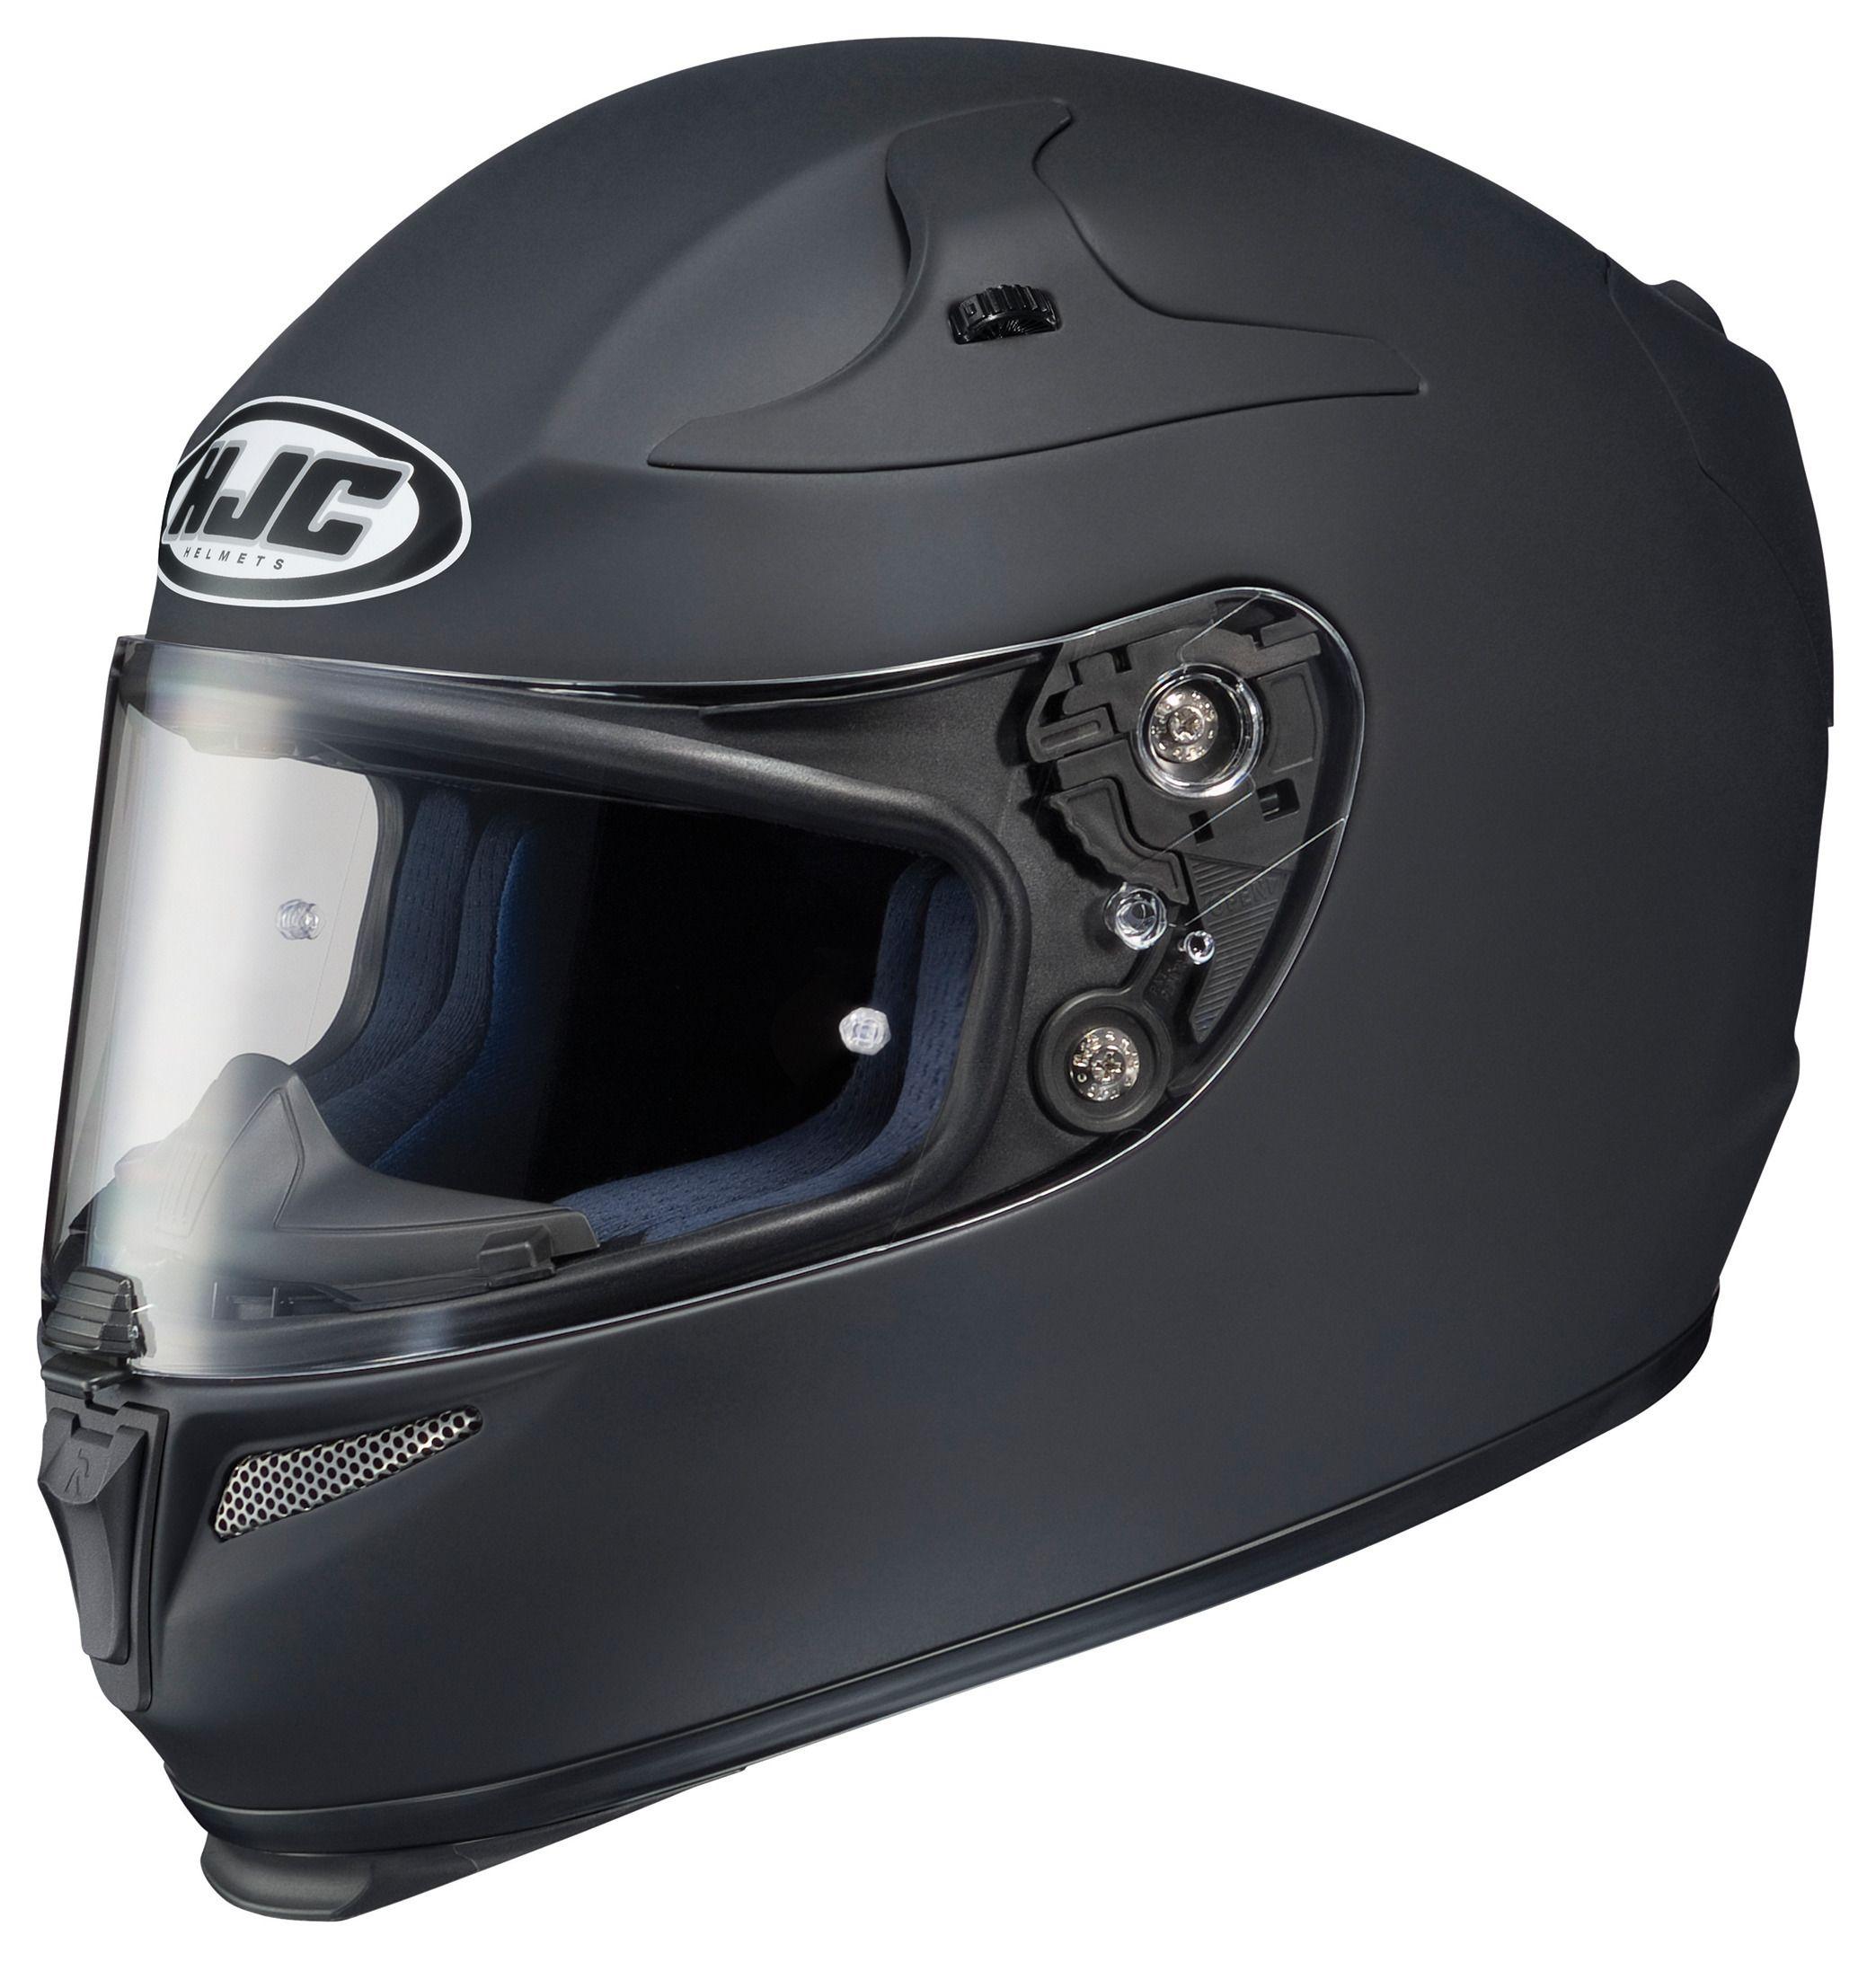 hjc rpha 10 pro helmet revzilla. Black Bedroom Furniture Sets. Home Design Ideas